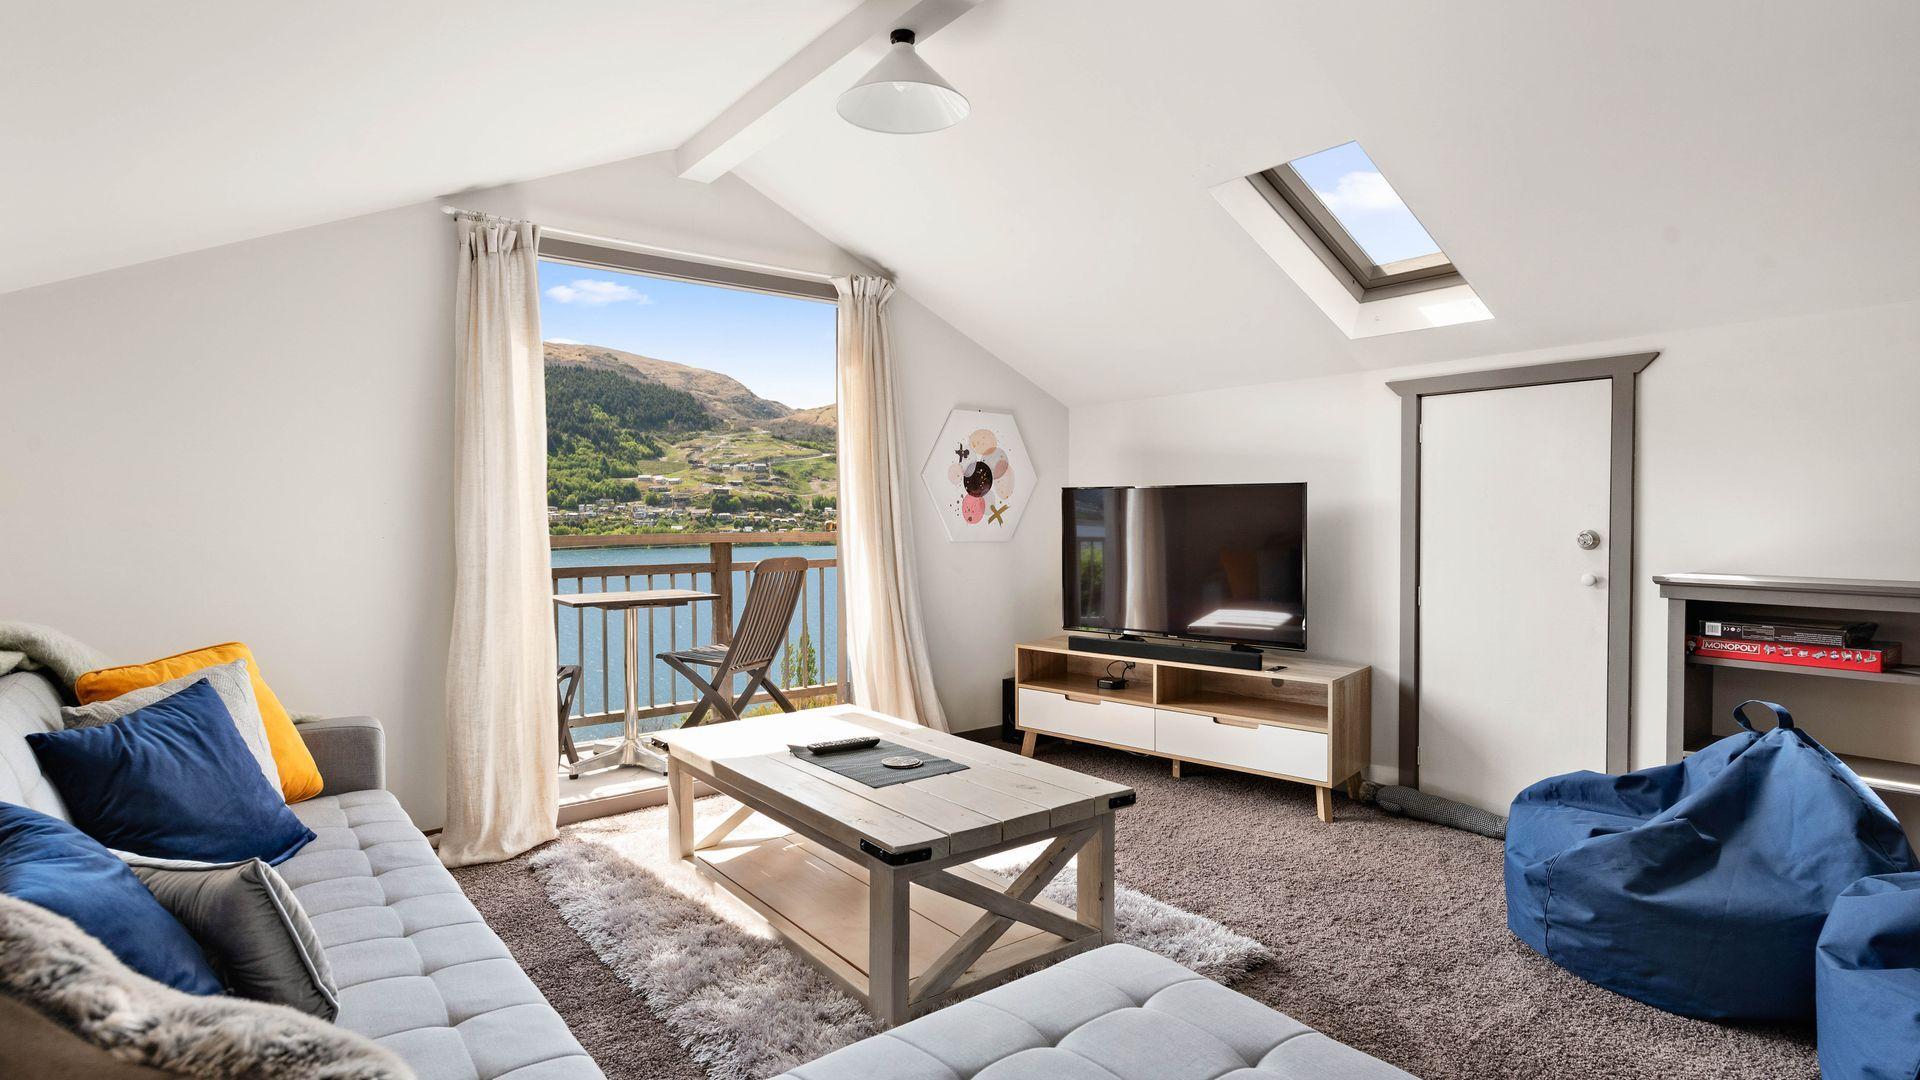 Sunny Lakeview Villa